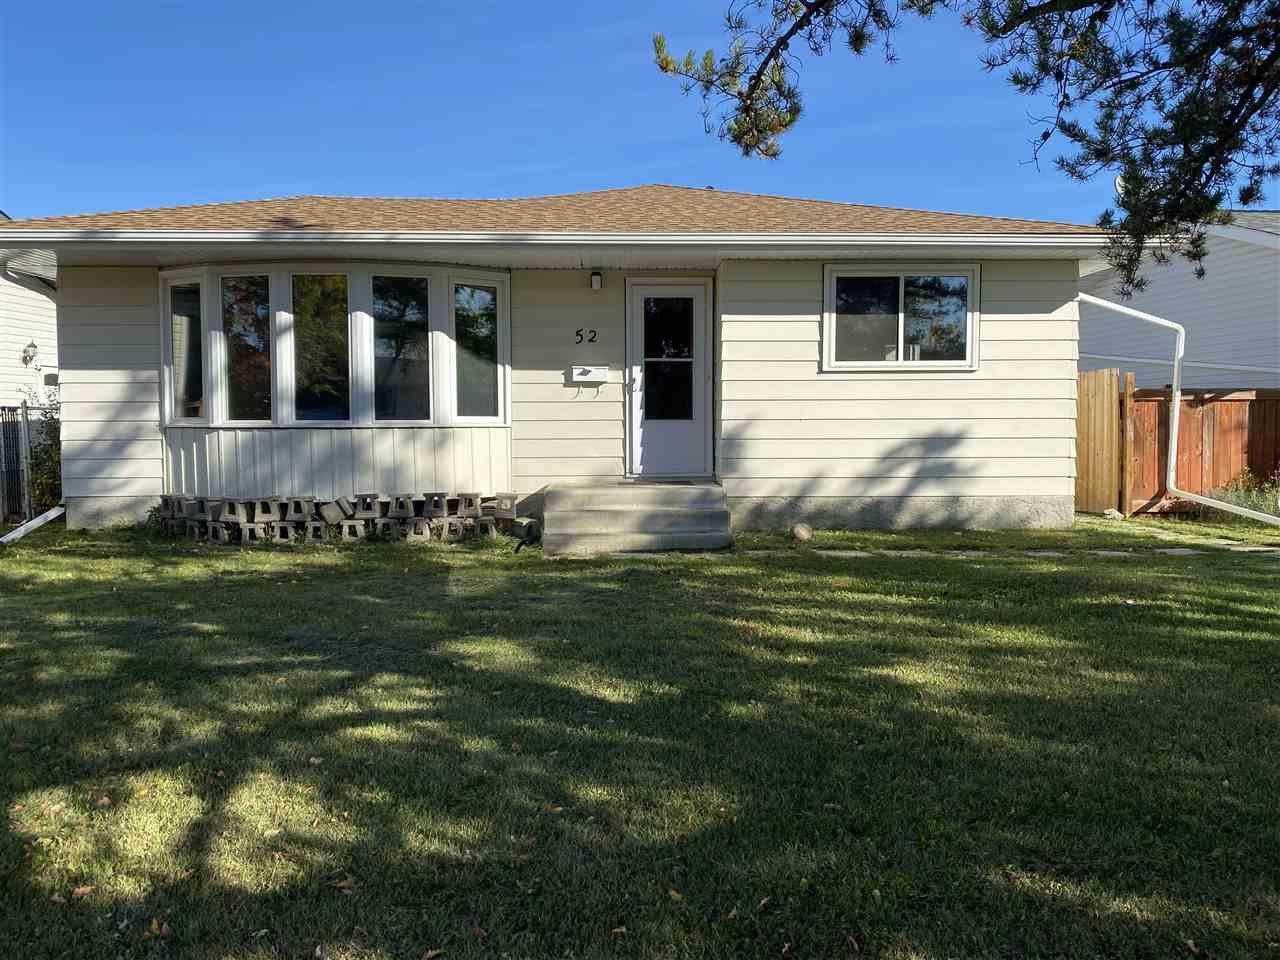 Main Photo: 52 NOOTKA Road: Leduc House for sale : MLS®# E4216256